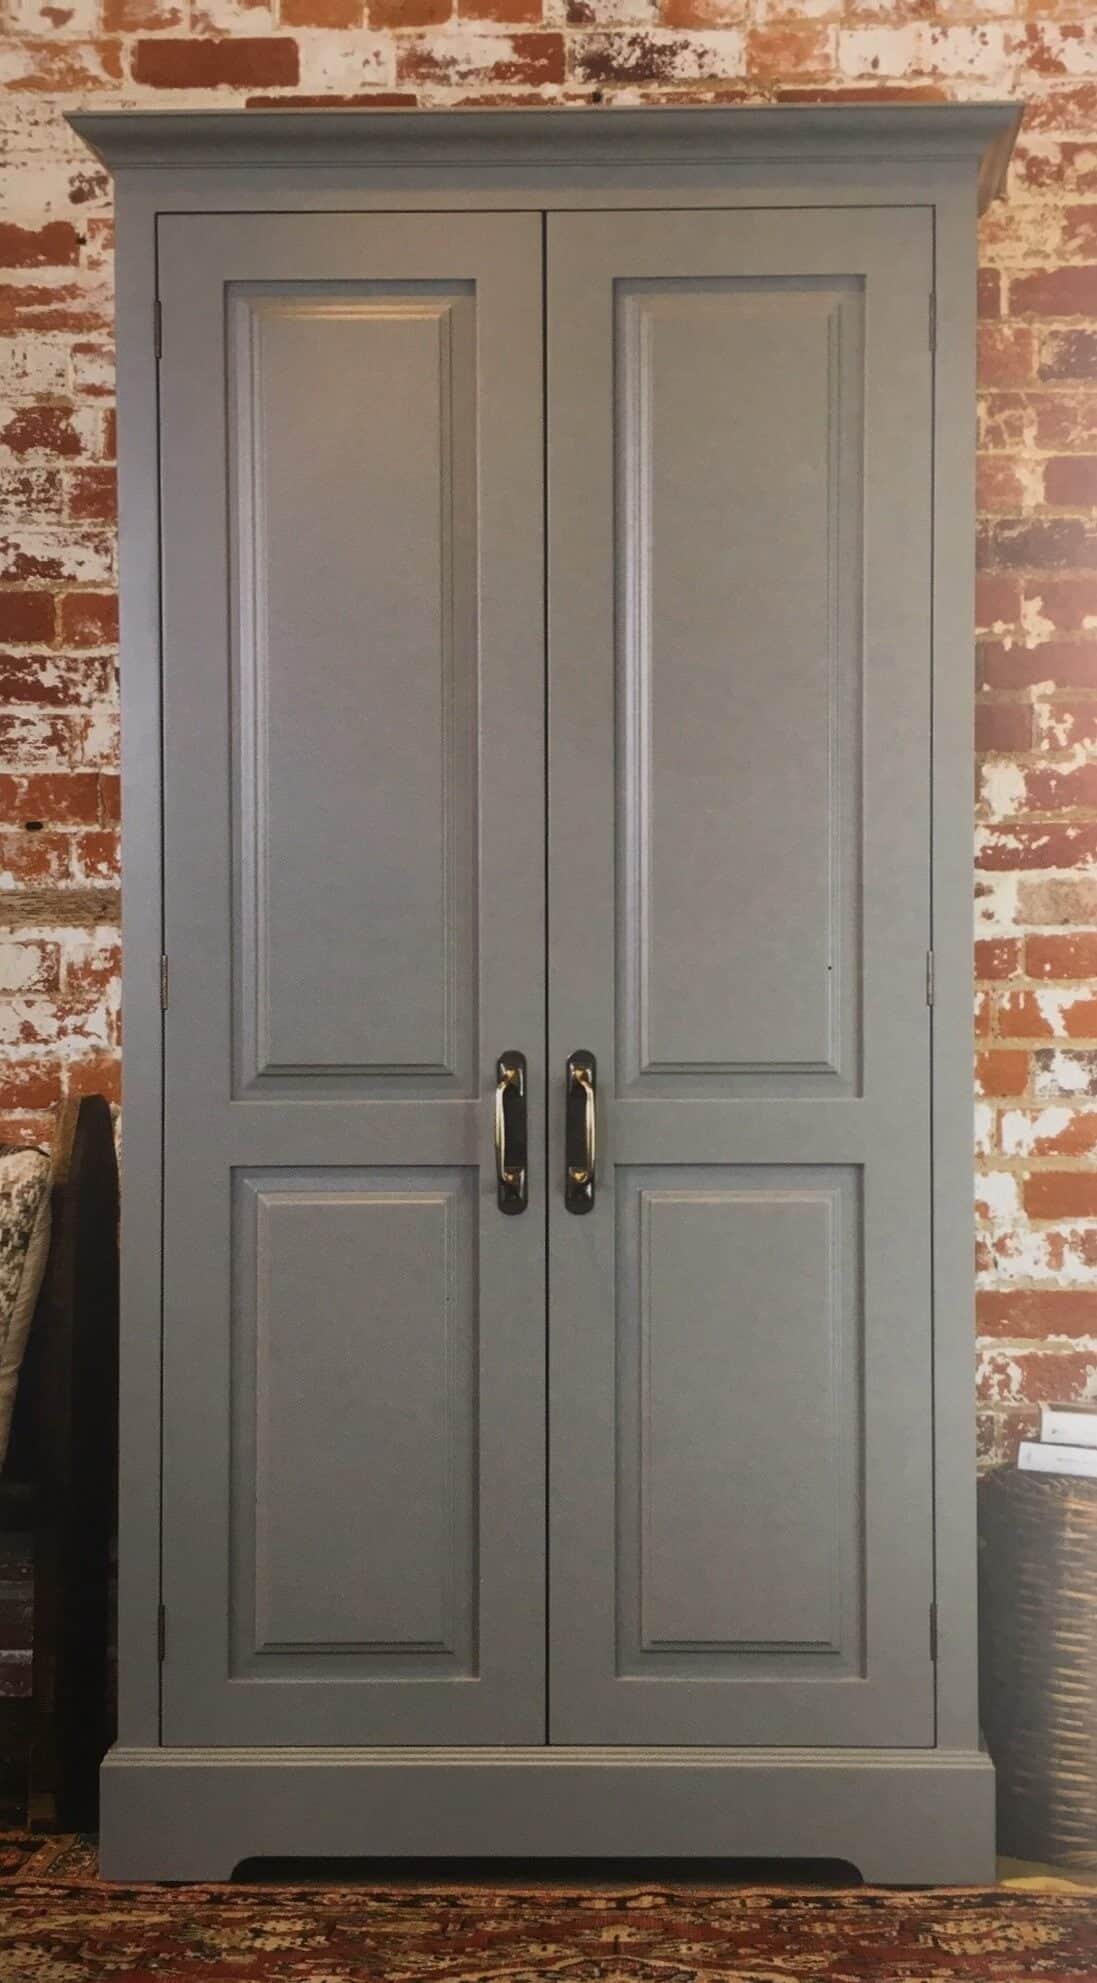 Freestanding Double Door Wardrobe John Lewis Of Hungerford